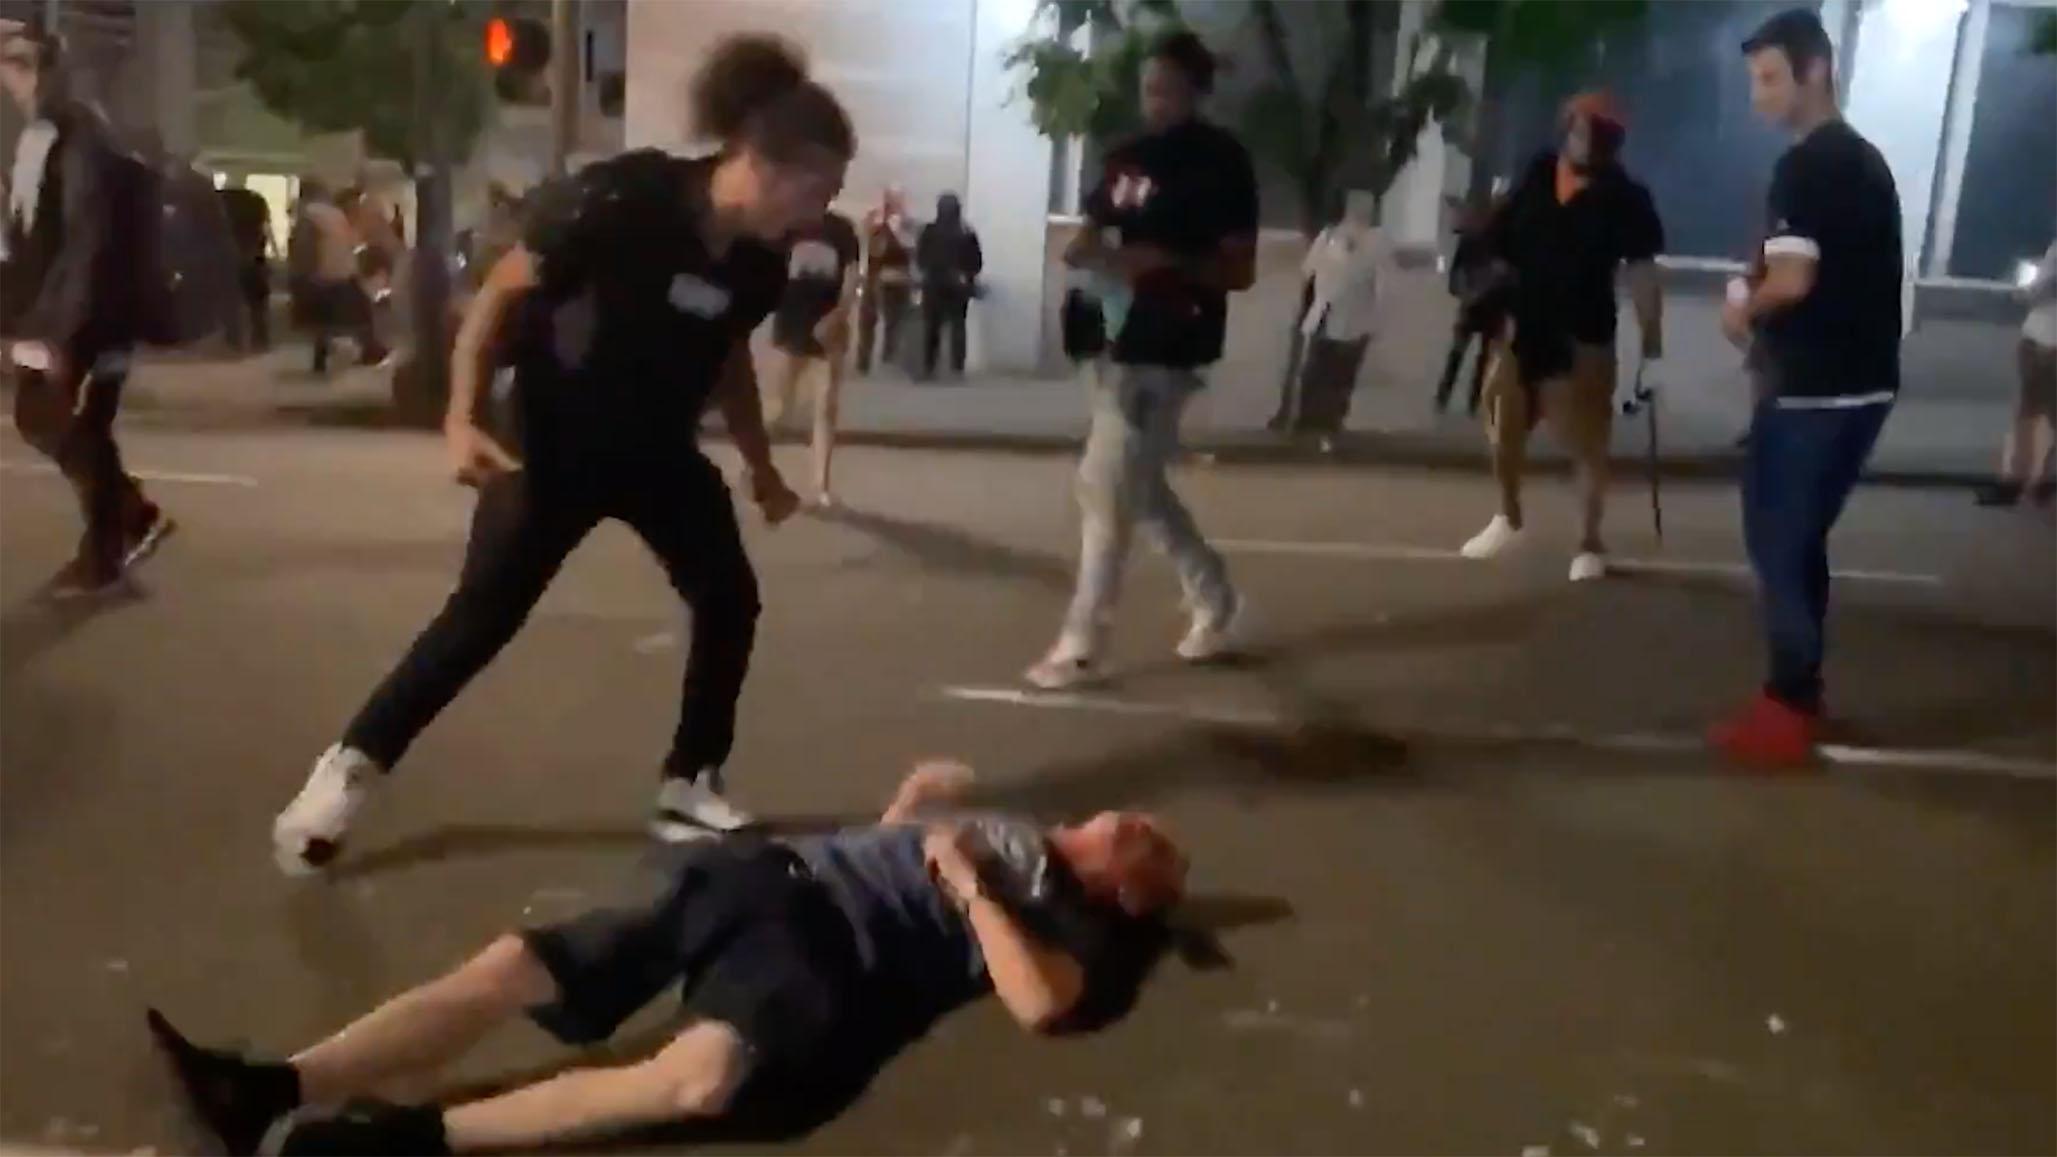 Black Lives Matter, Antifa Crowd Beat Man Unconscious in Portland ...